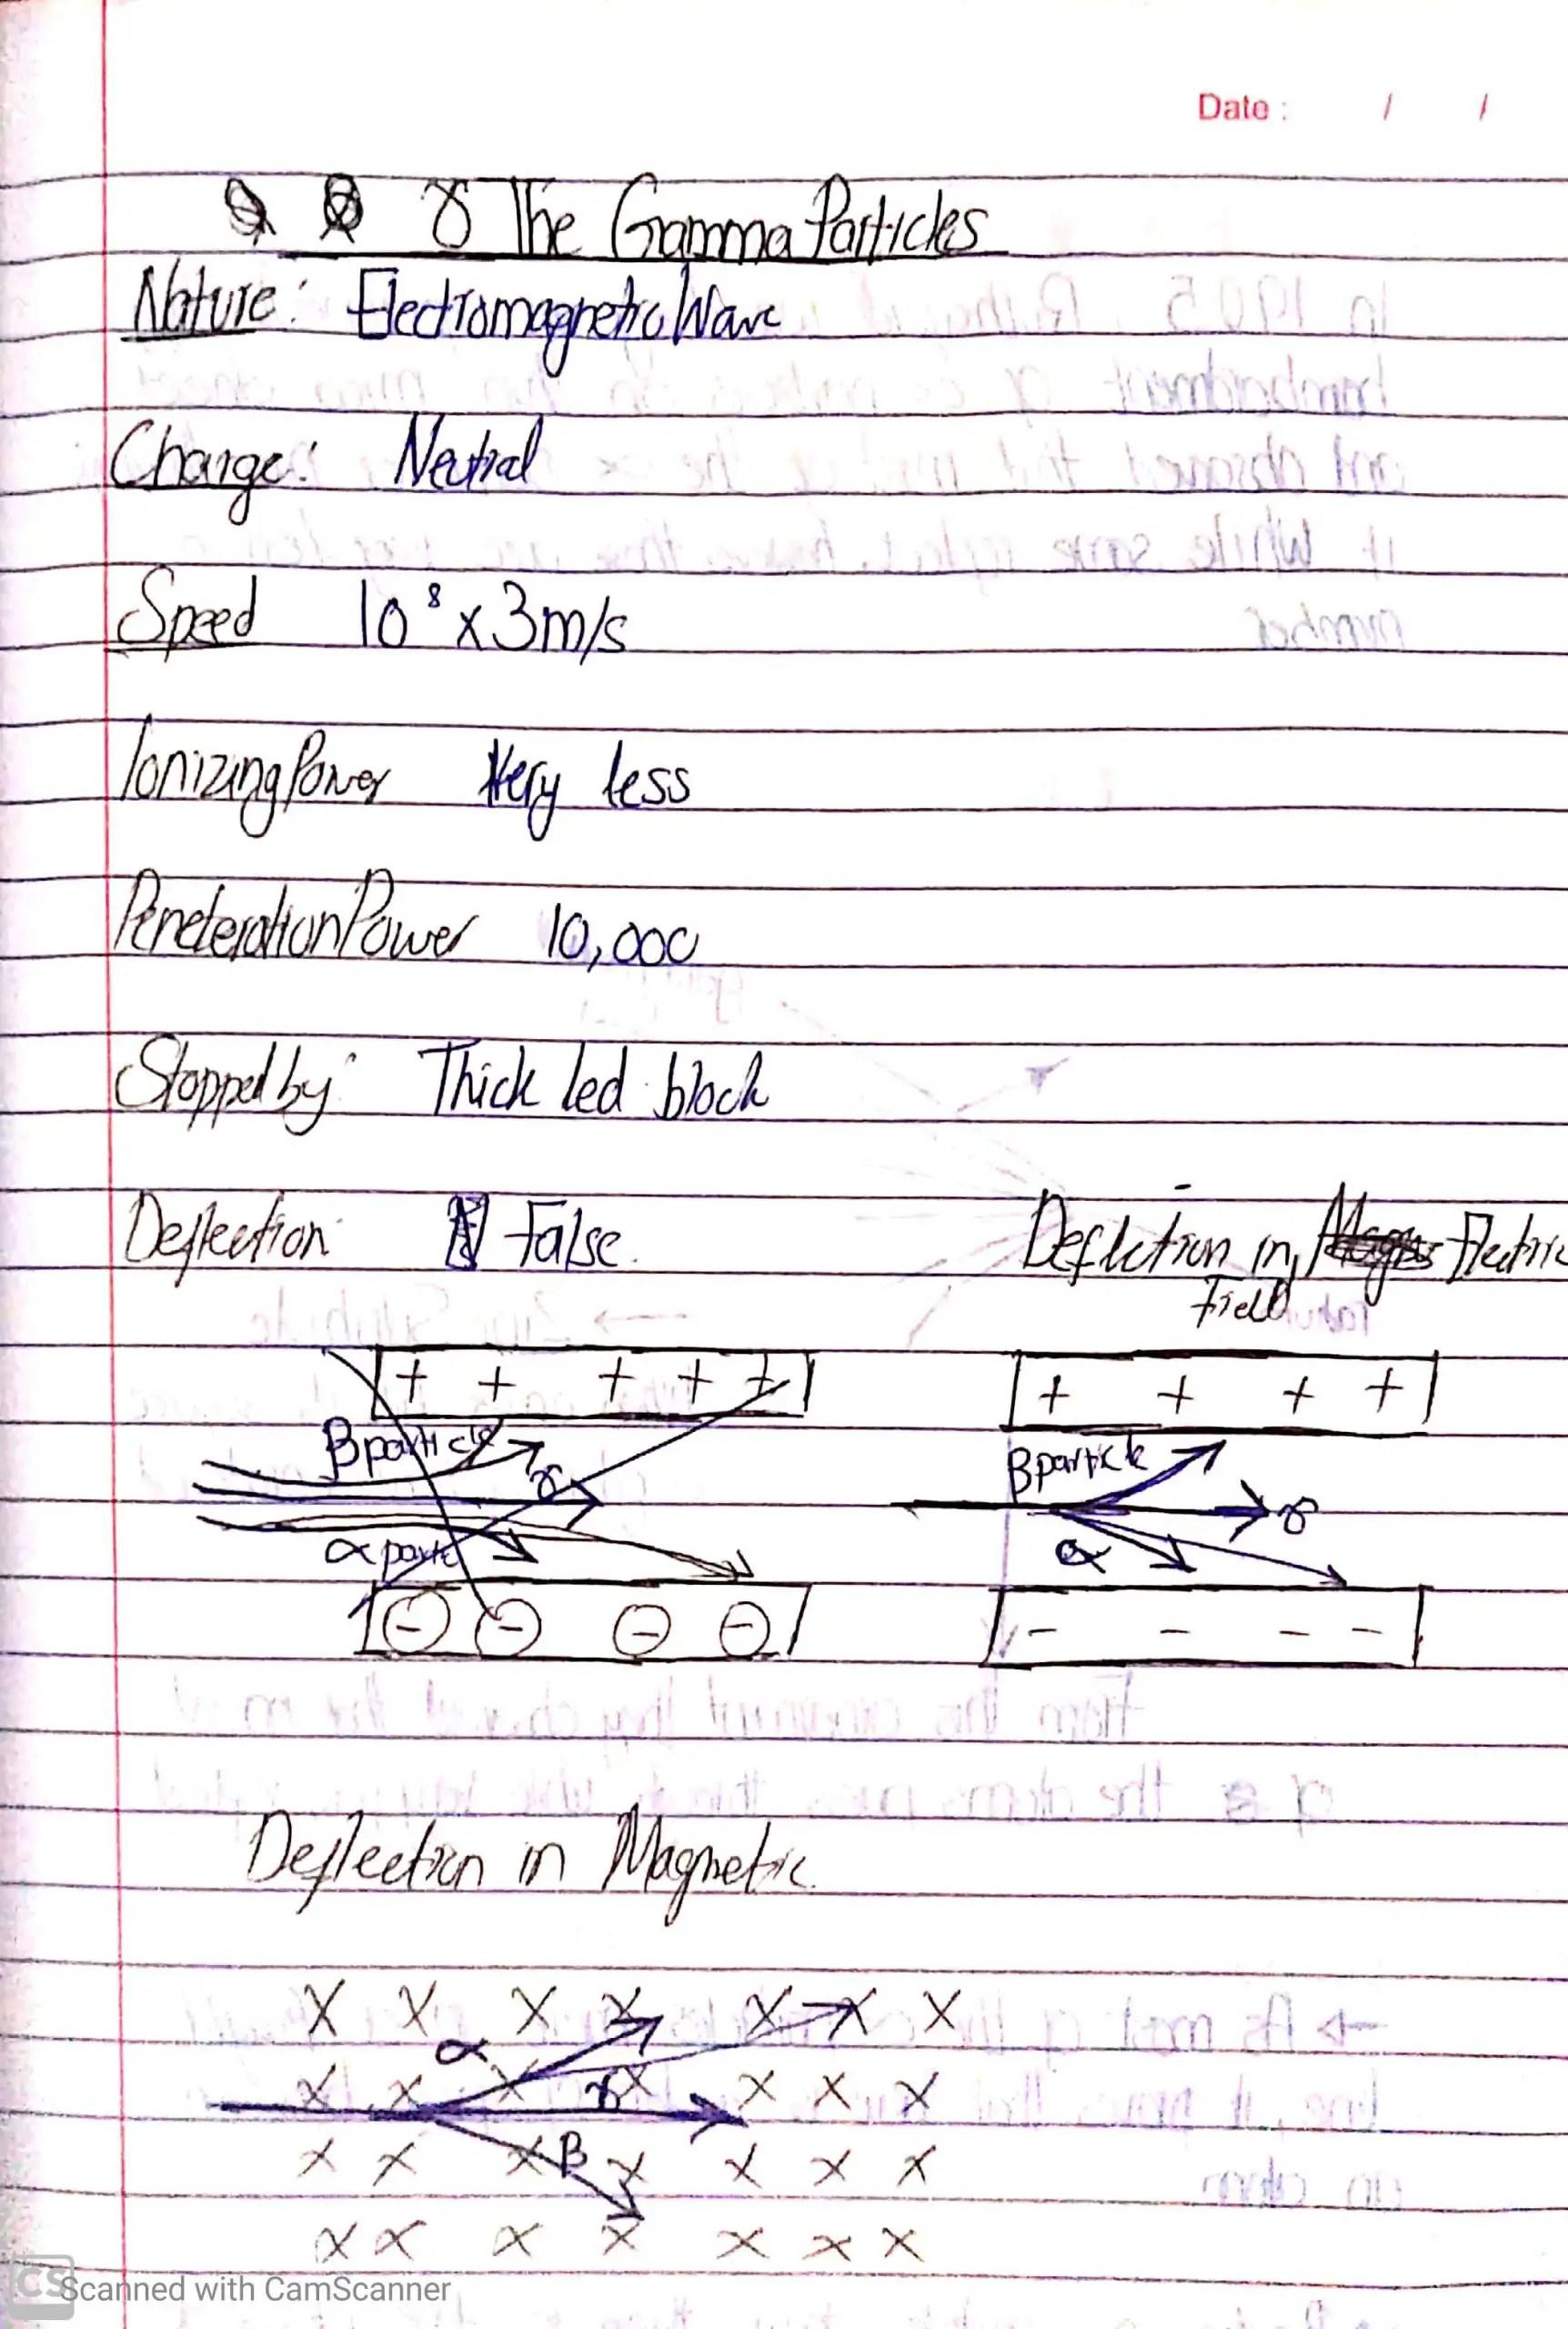 Nuclear Physics igcse_5